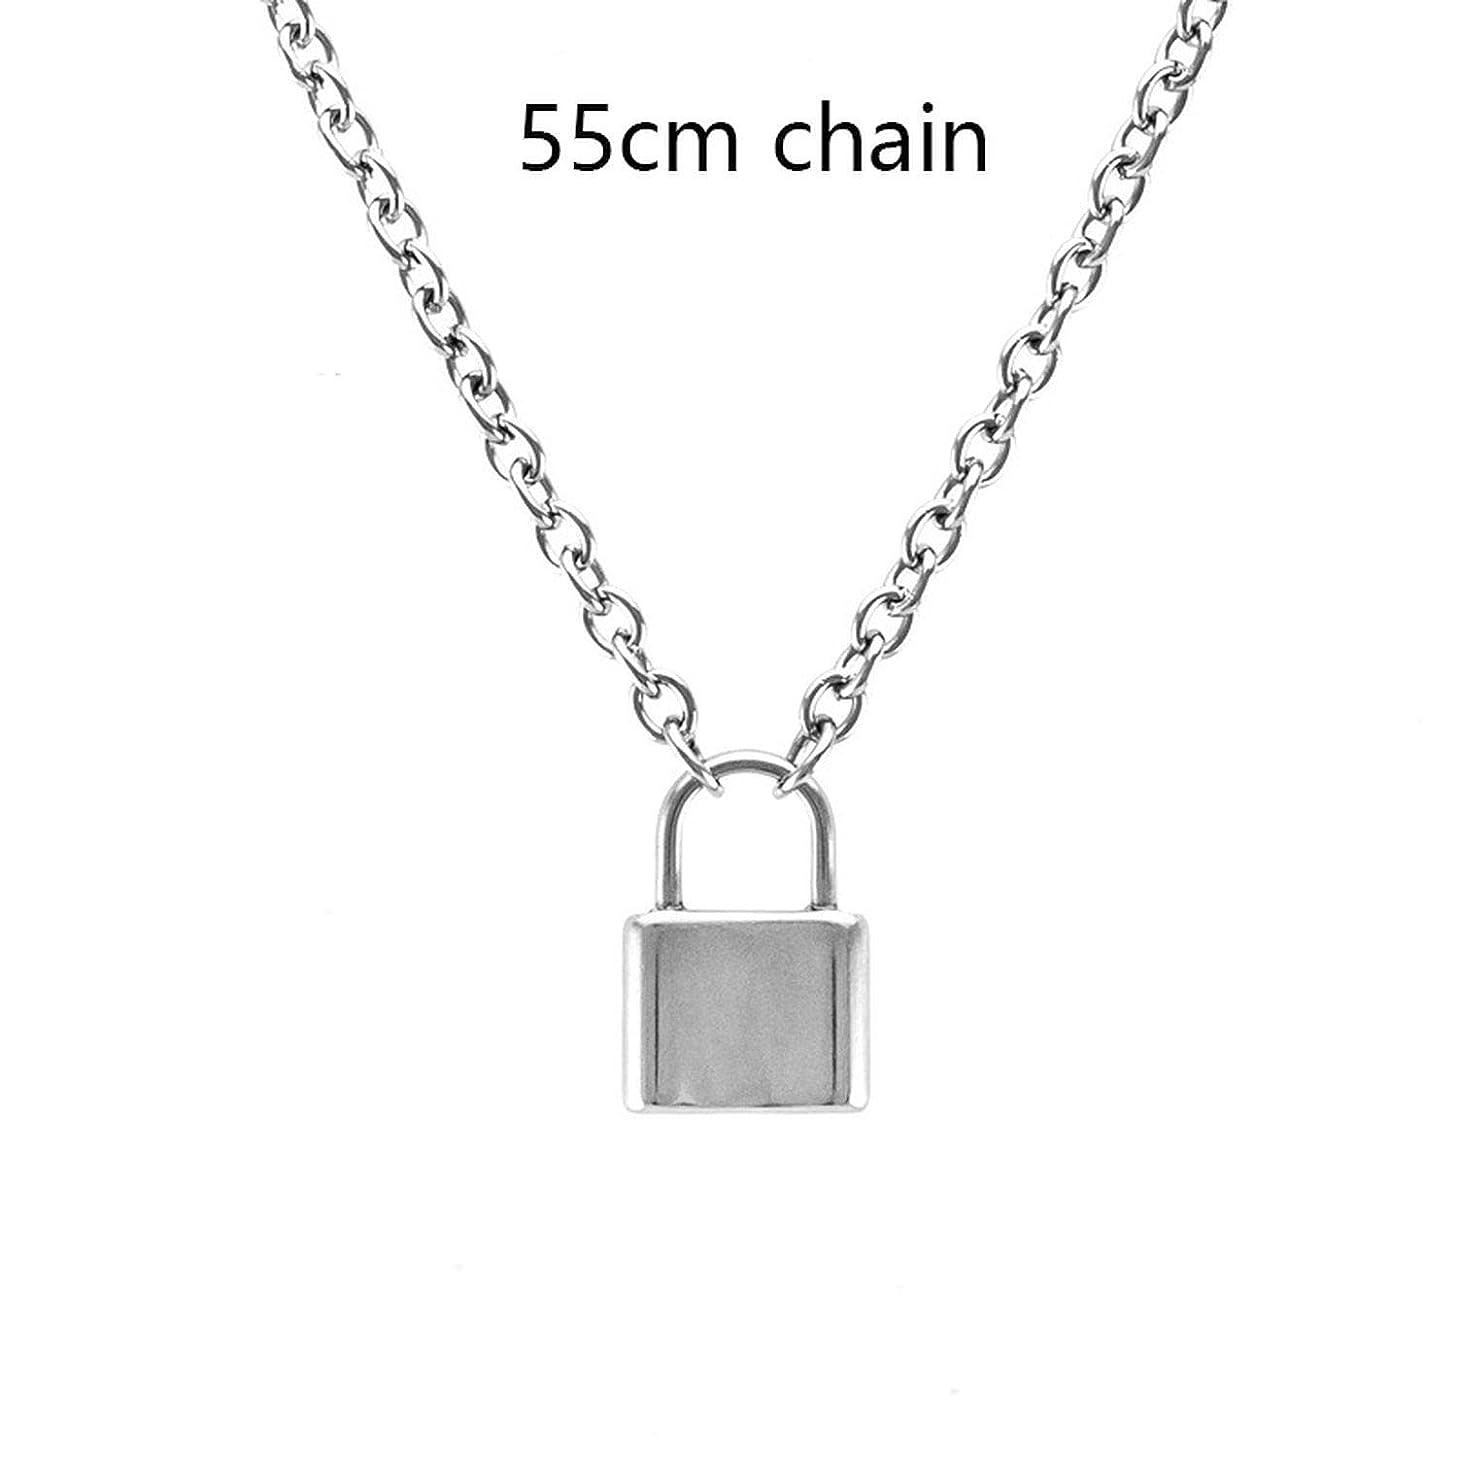 Joyhul Handmade Men Women Stainless Steel Square Lock Pendant Necklace Padlock Charms Choker Necklace